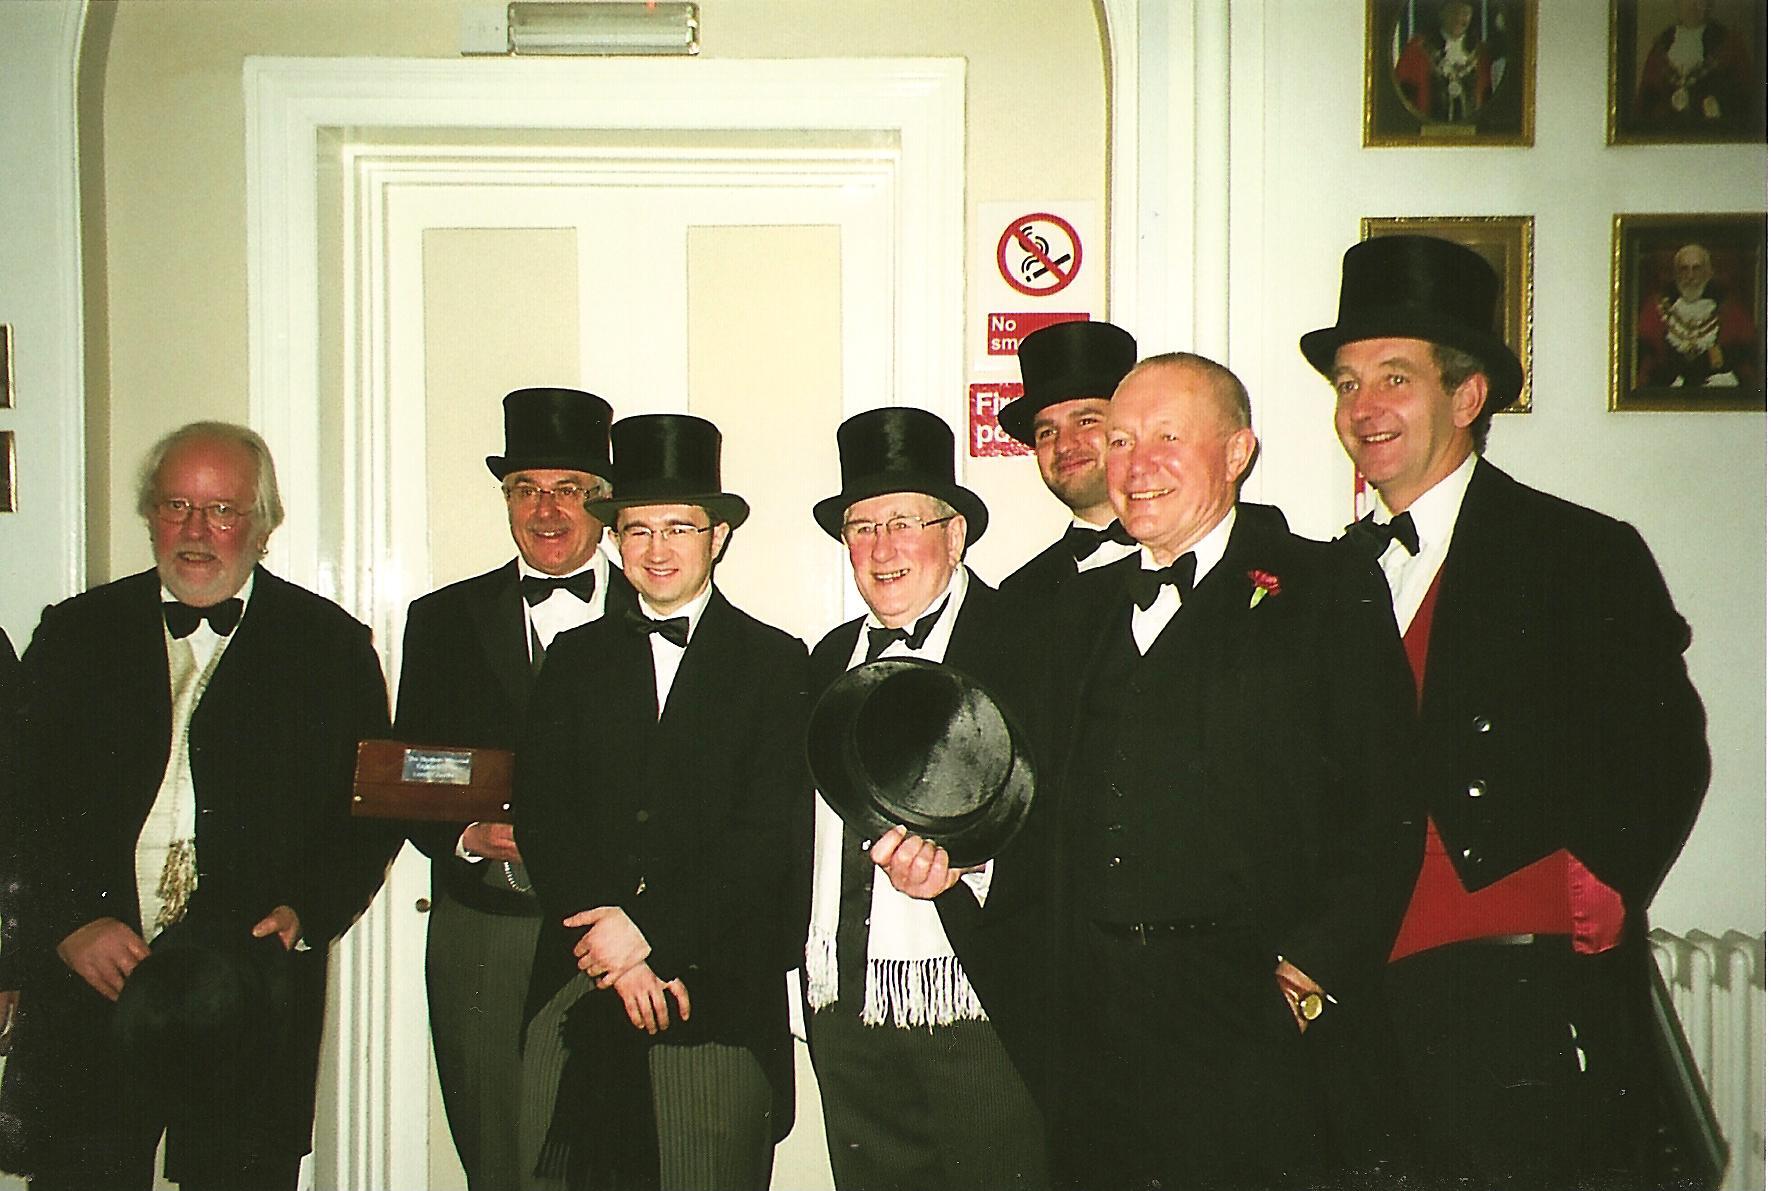 Bodmin Wassailers inside Bodmin Town Council